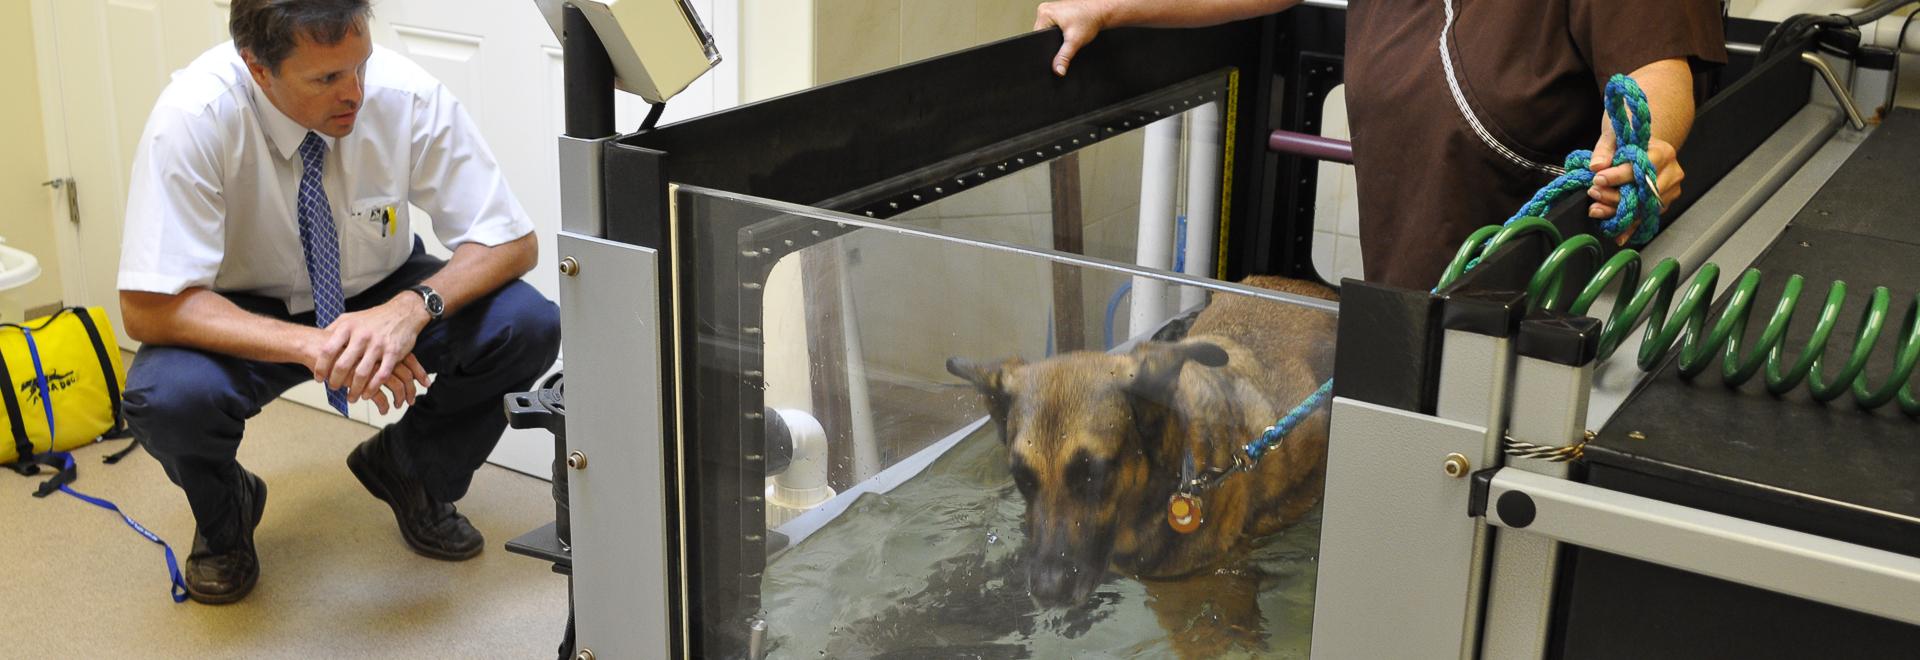 Veterinarian Services In Chicago Ridge Il Chicago Animal Rehab